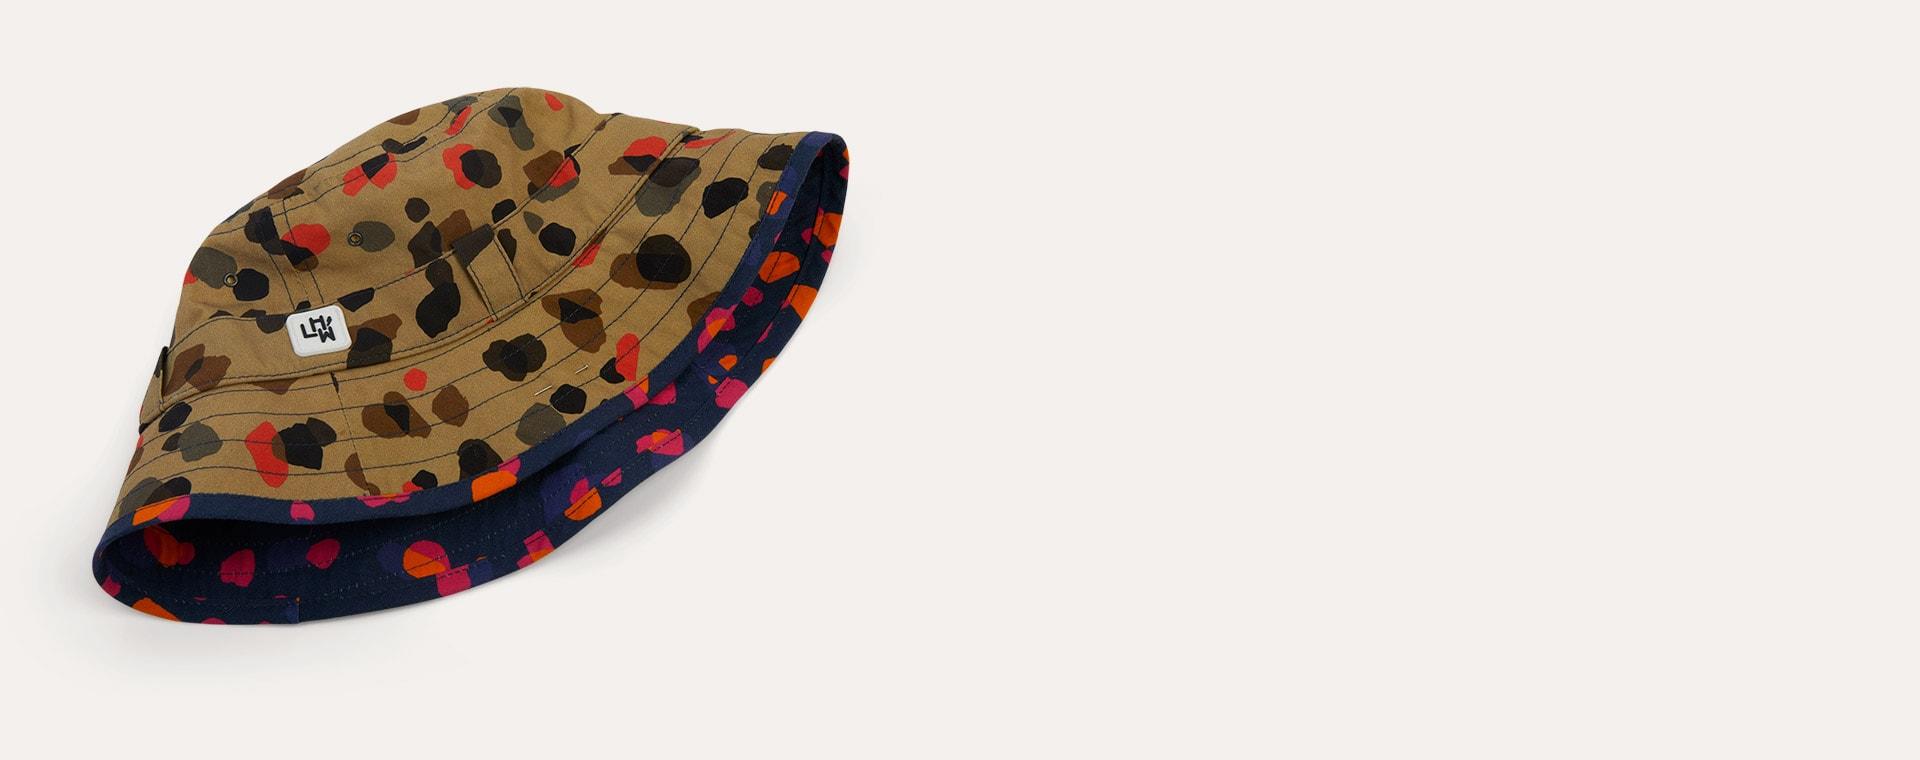 Leopard Neutral Little Hotdog Watson The Adventurer Bucket Hat